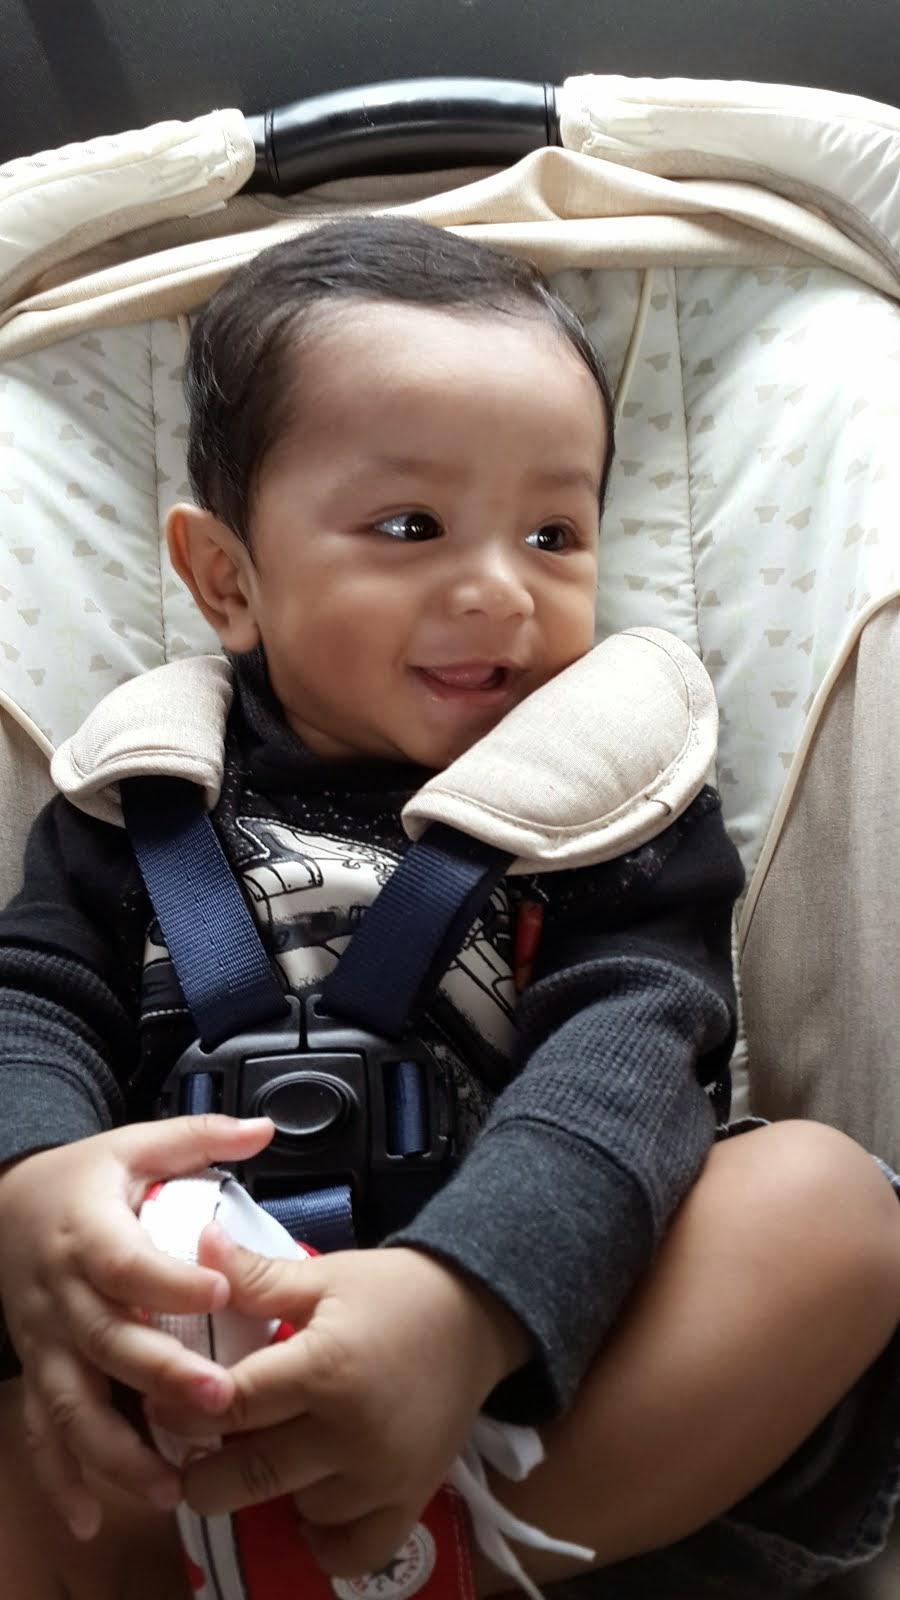 Aqil @ 8 months